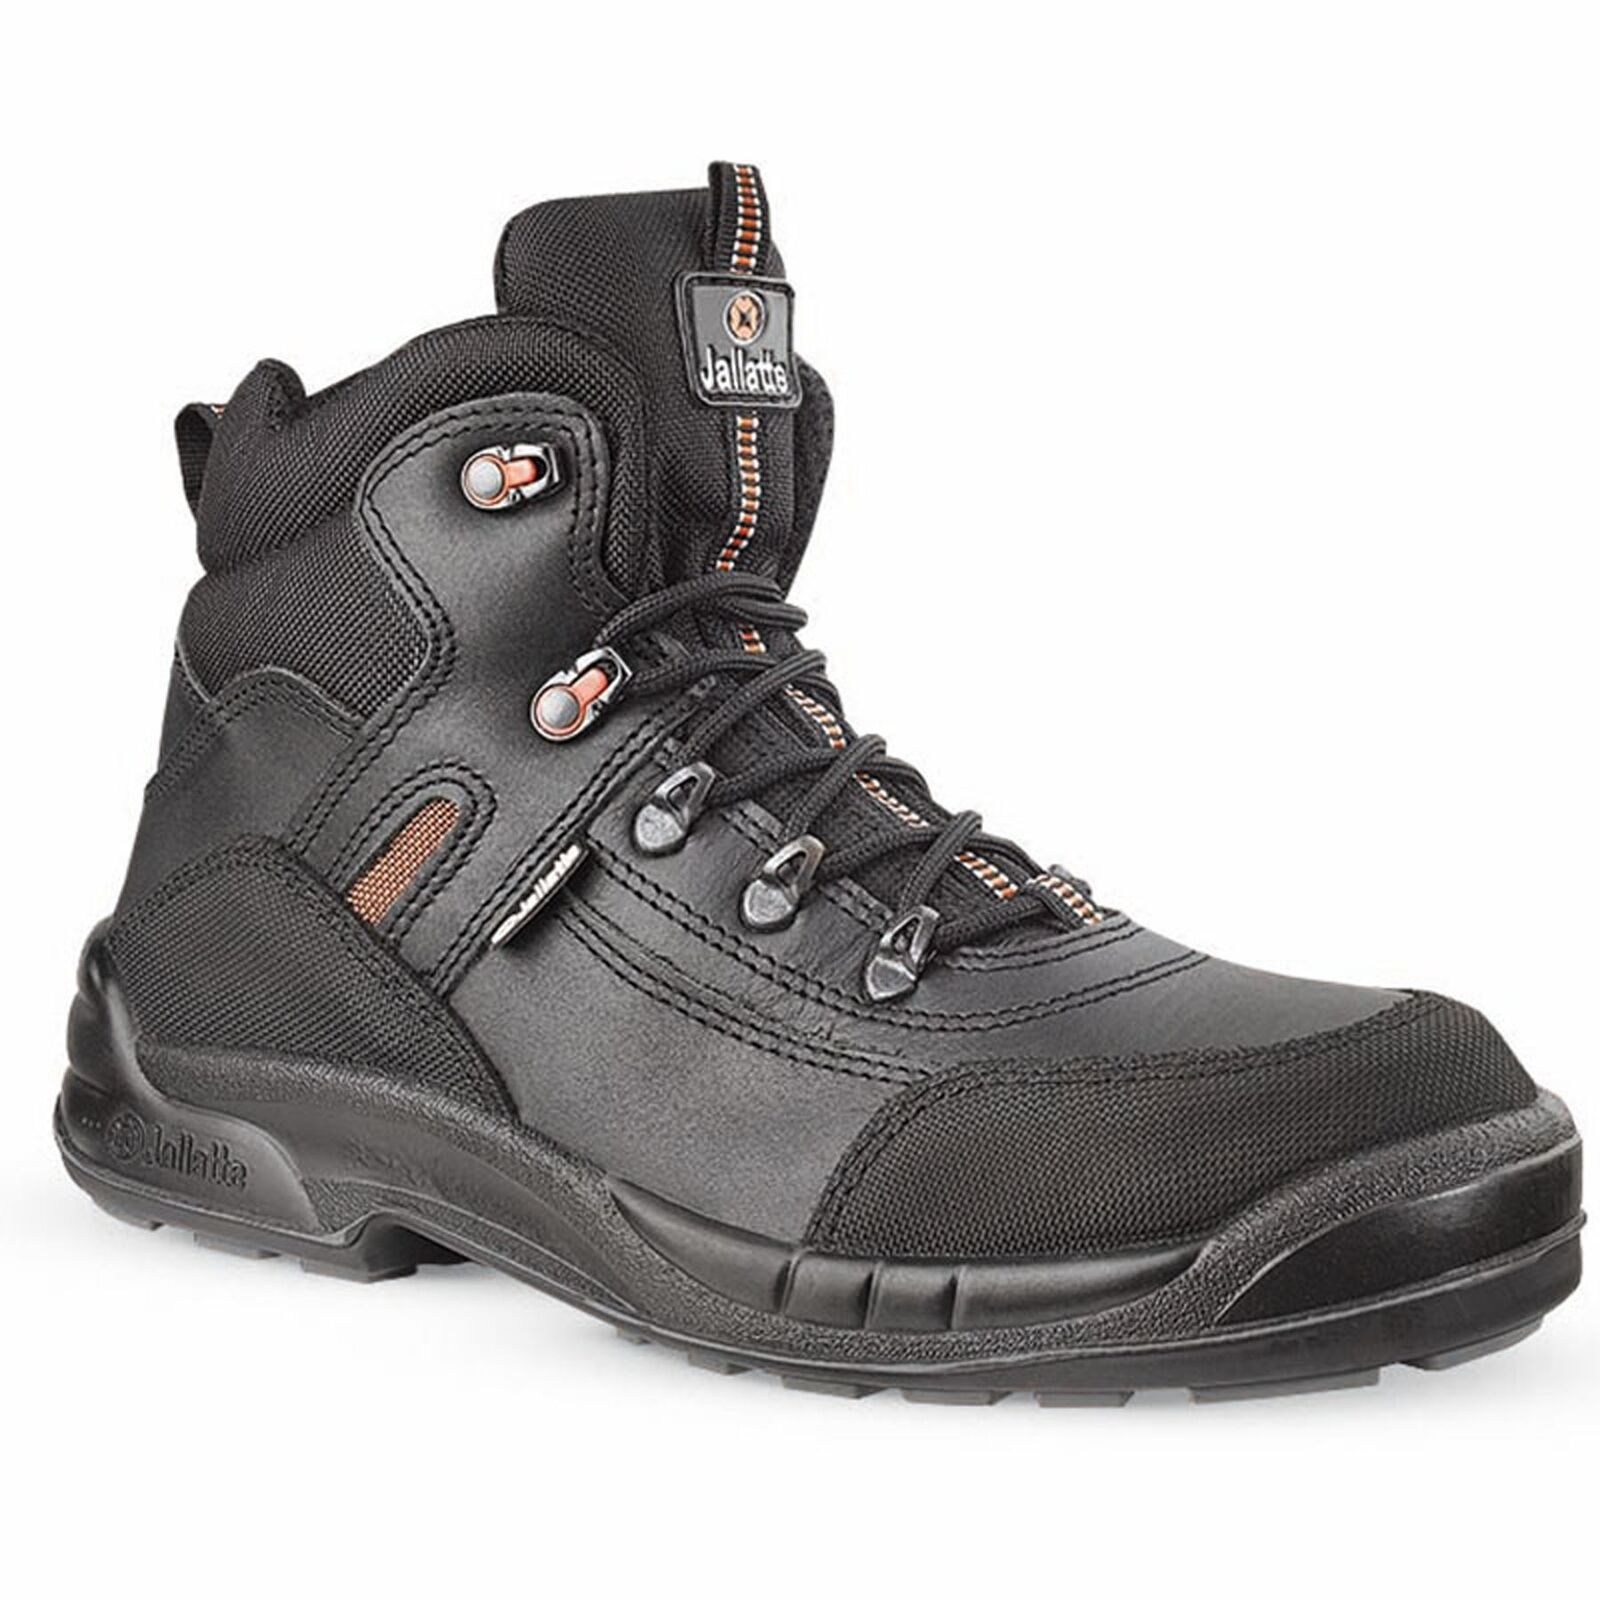 Jallatte Jalsphinx J0628 Black Mens Boots Lace Safety Toecap Midsole Work S3